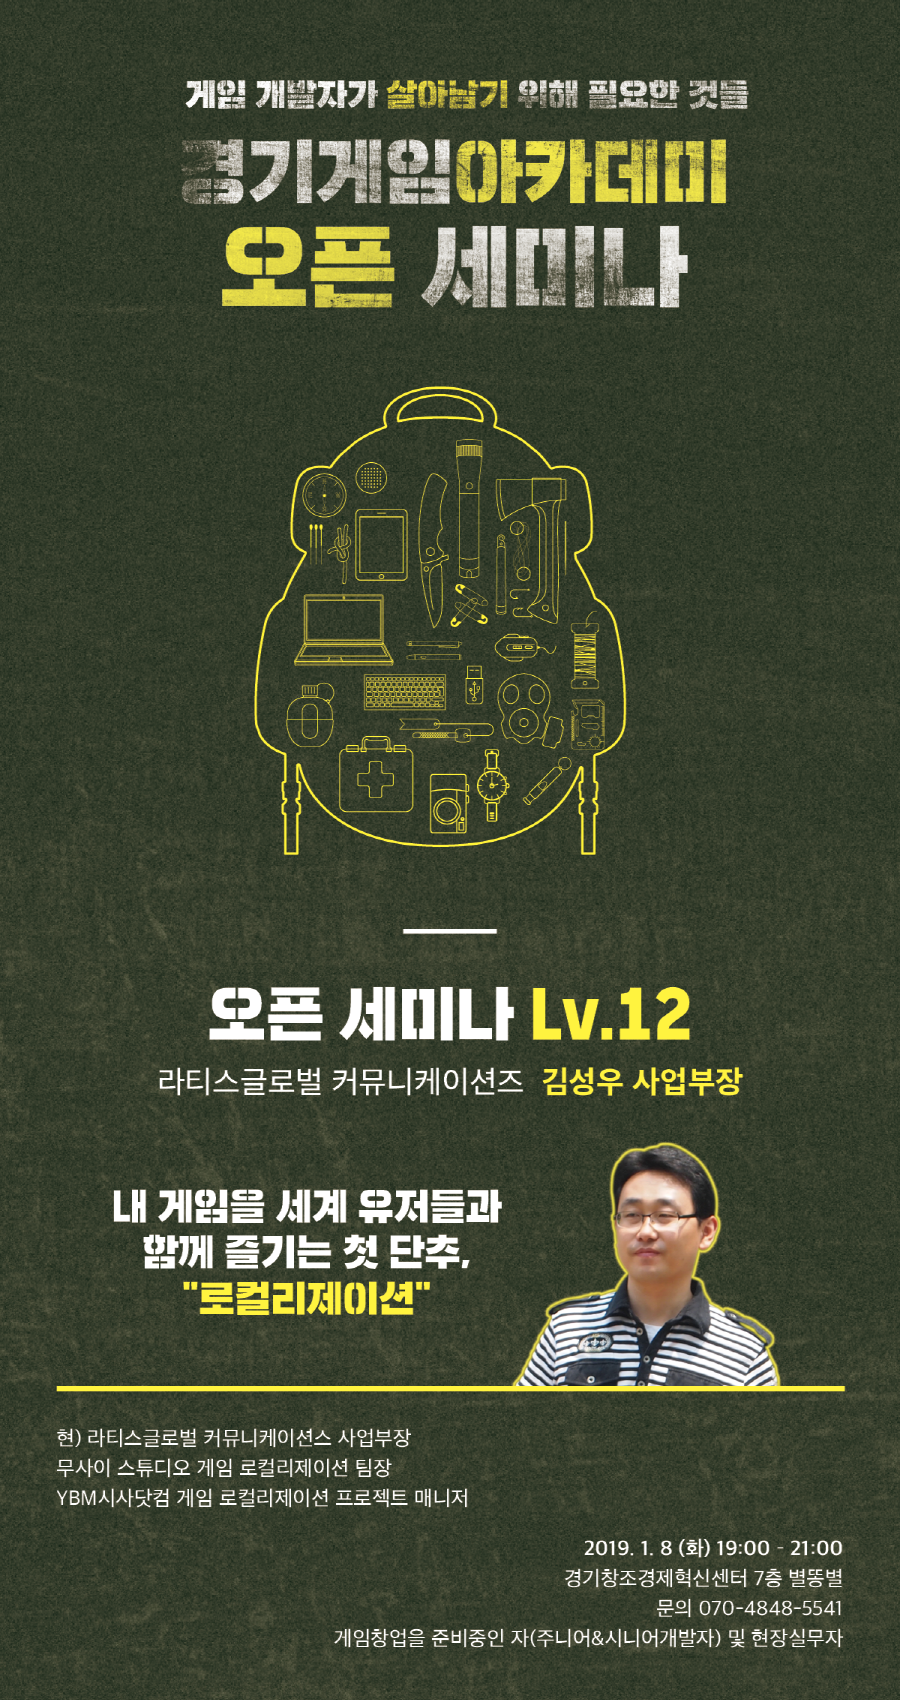 181217_gg_gameacademy_webpage_seminar_Lv11.png